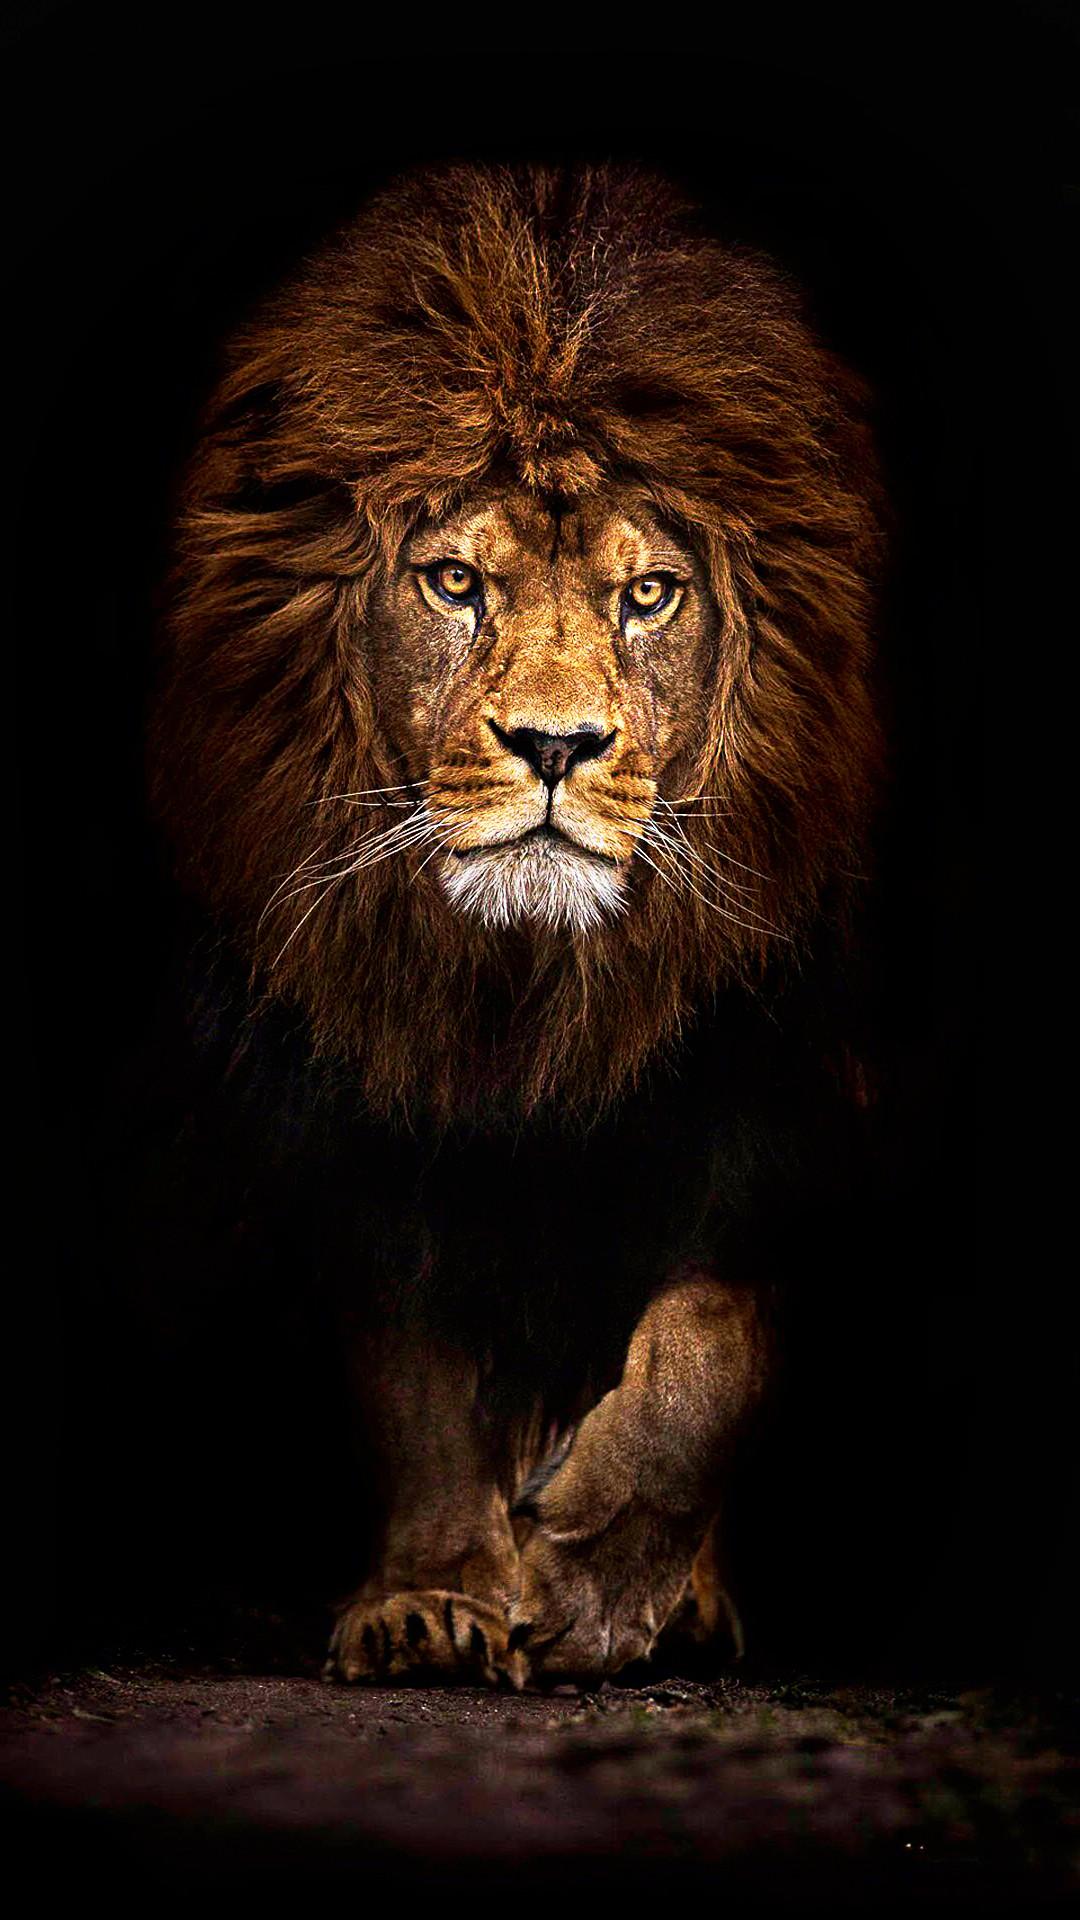 Lion Pictures Wallpaper 71 Images